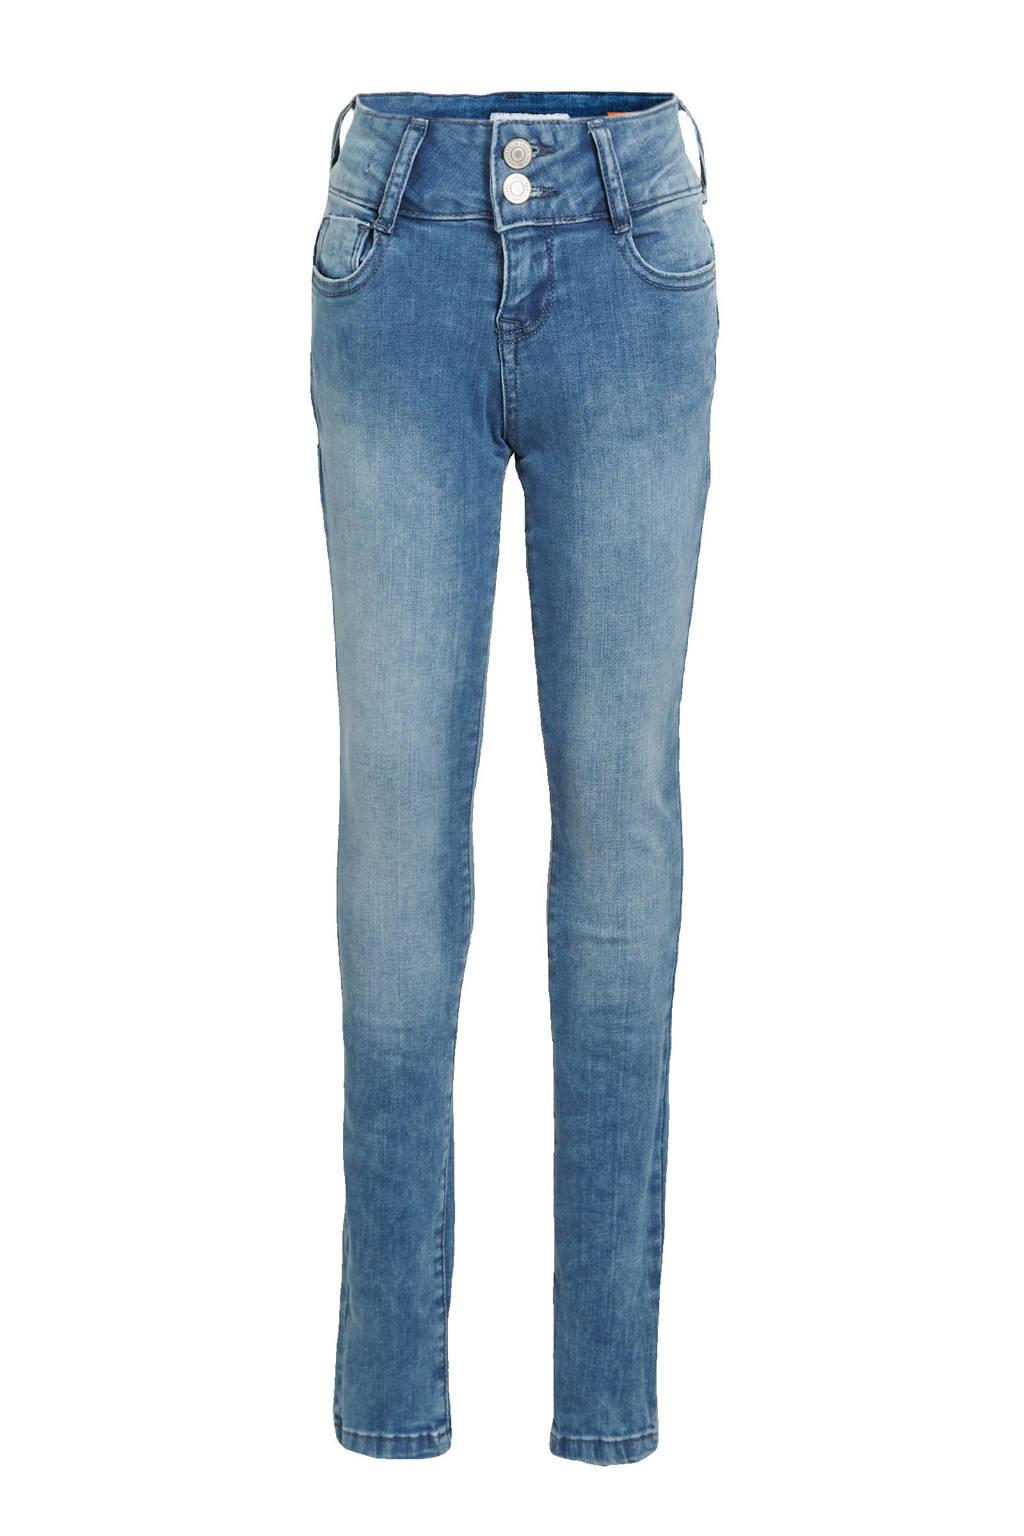 Cars high waist skinny jeans Amazing stone used, Stone used